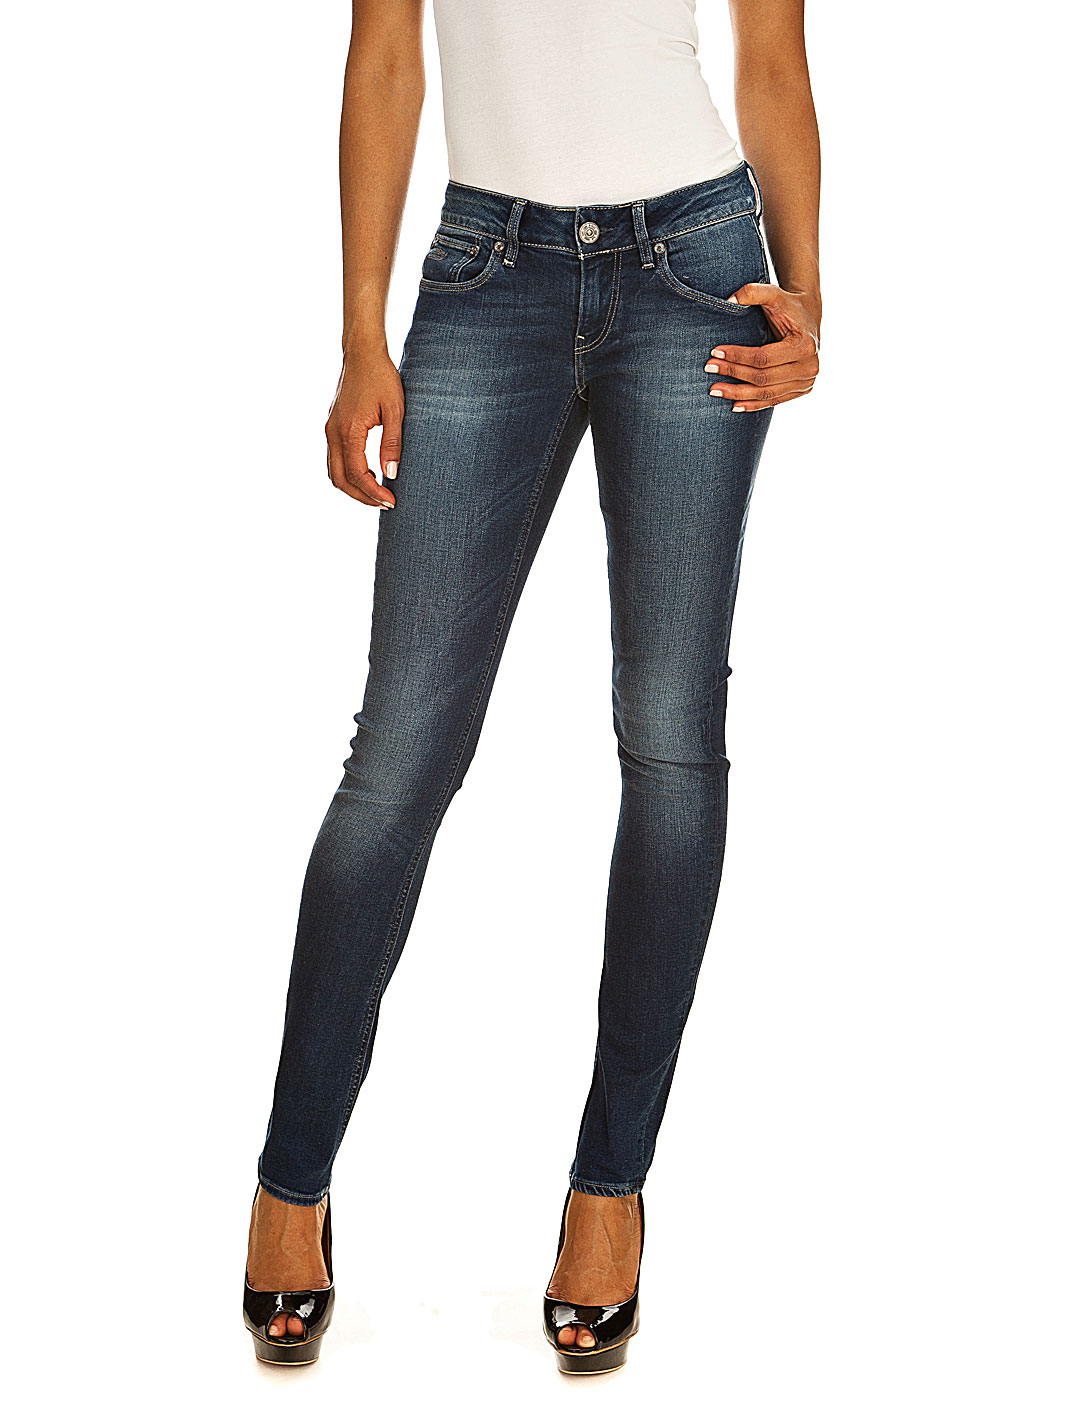 Jeans Femme Sojeans G Star 3301 skinny wmn medium aged